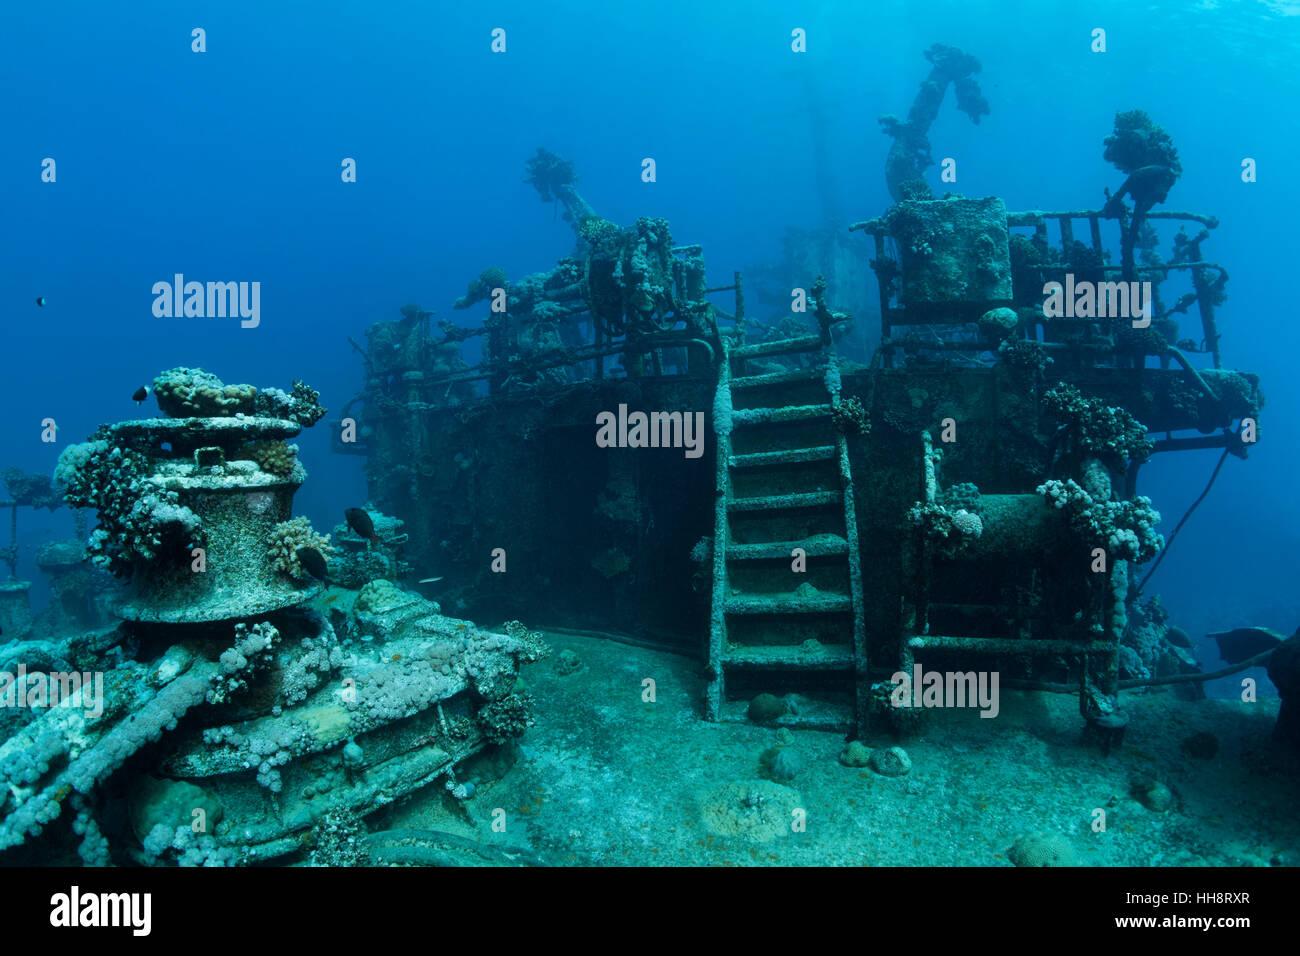 Deck of shipwreck, Russian wreck MS Khanka, former spy ship or communications ship, Zabargad Island, Red Sea, Egypt - Stock Image